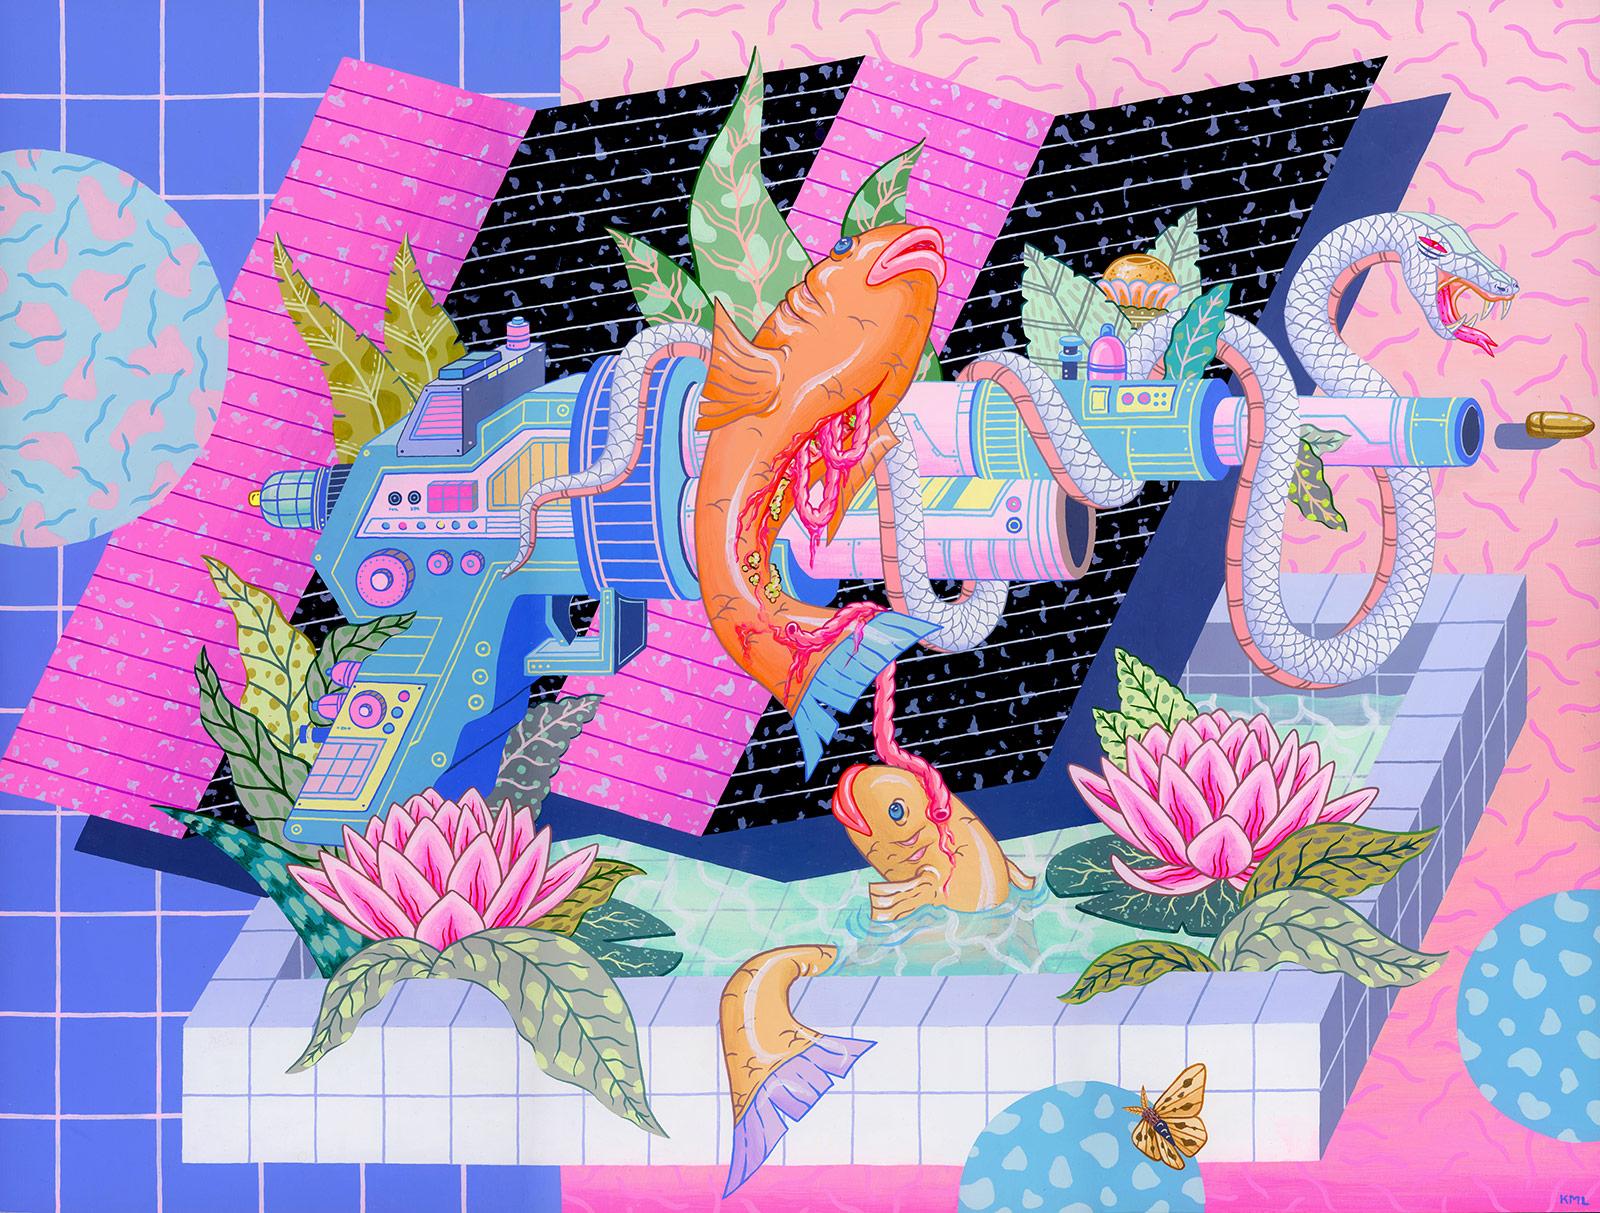 NSFW illustrations by Kristen Liu-Wong